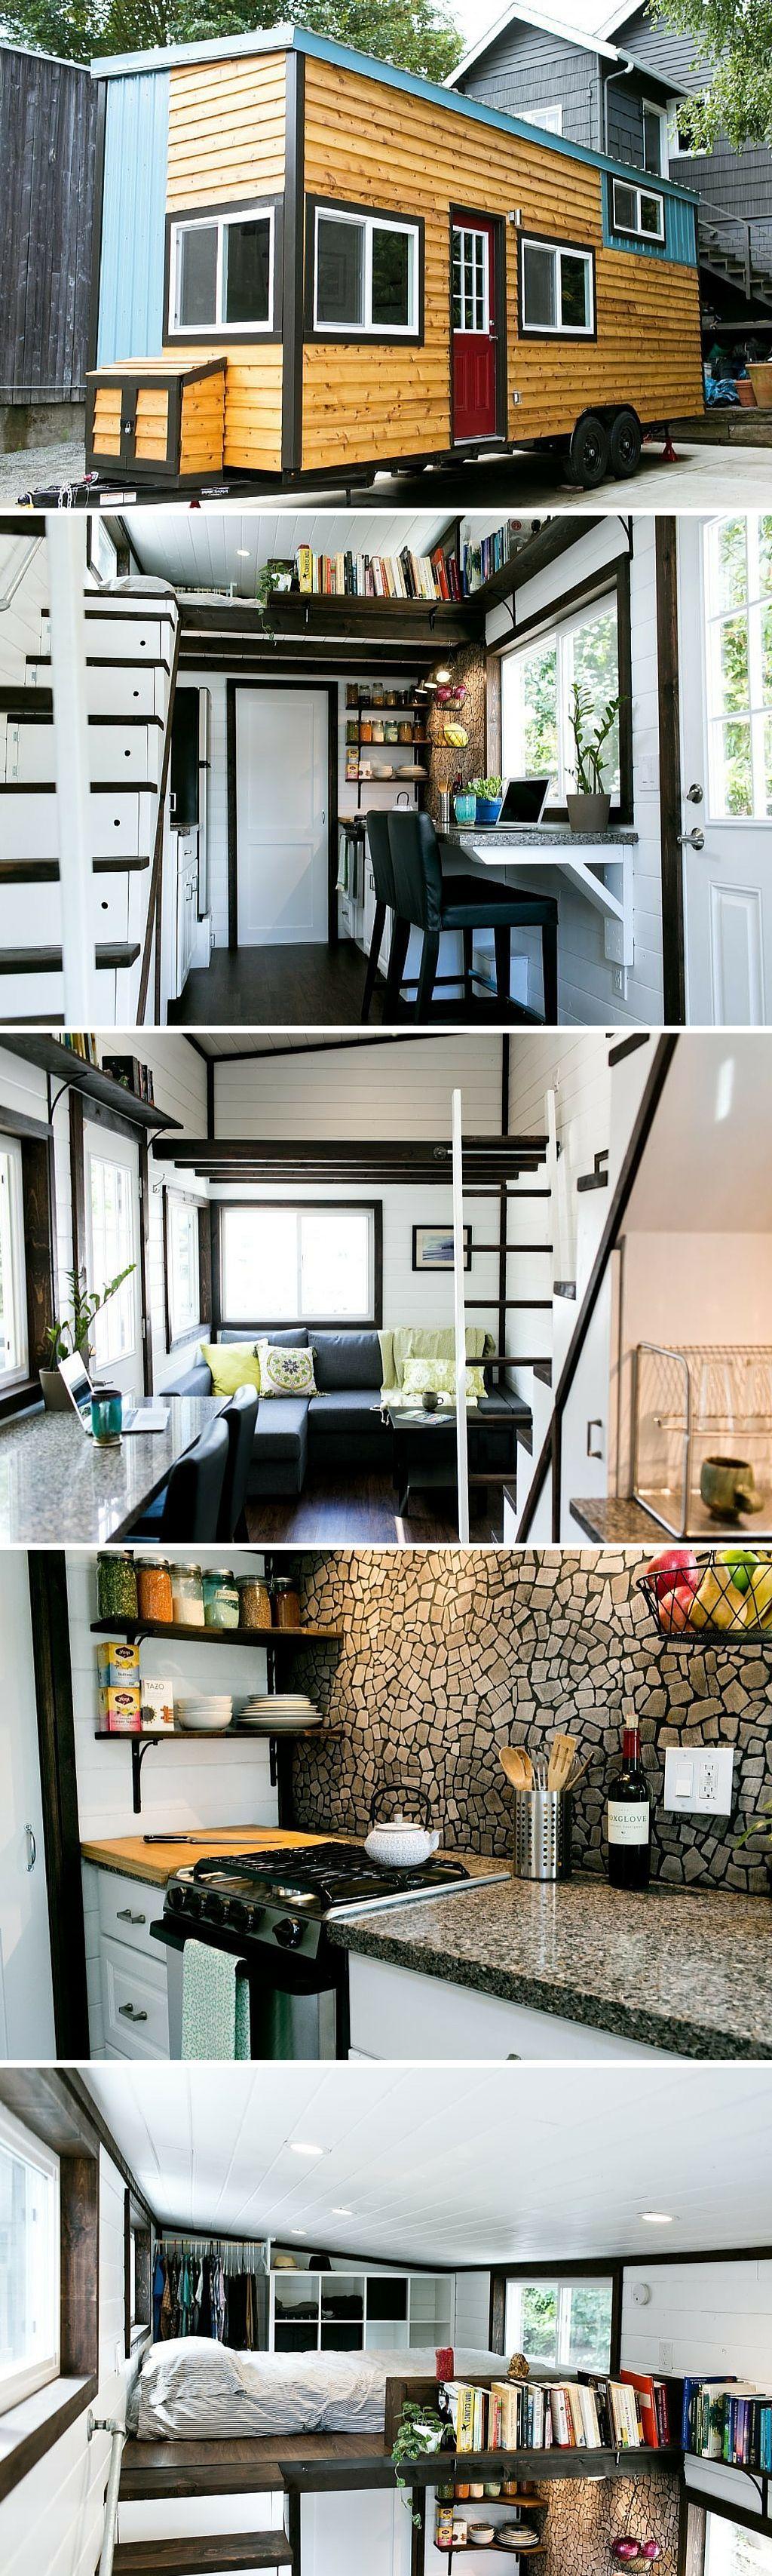 Me encantan estas mini casas hogar dulce hogar pinterest tiny